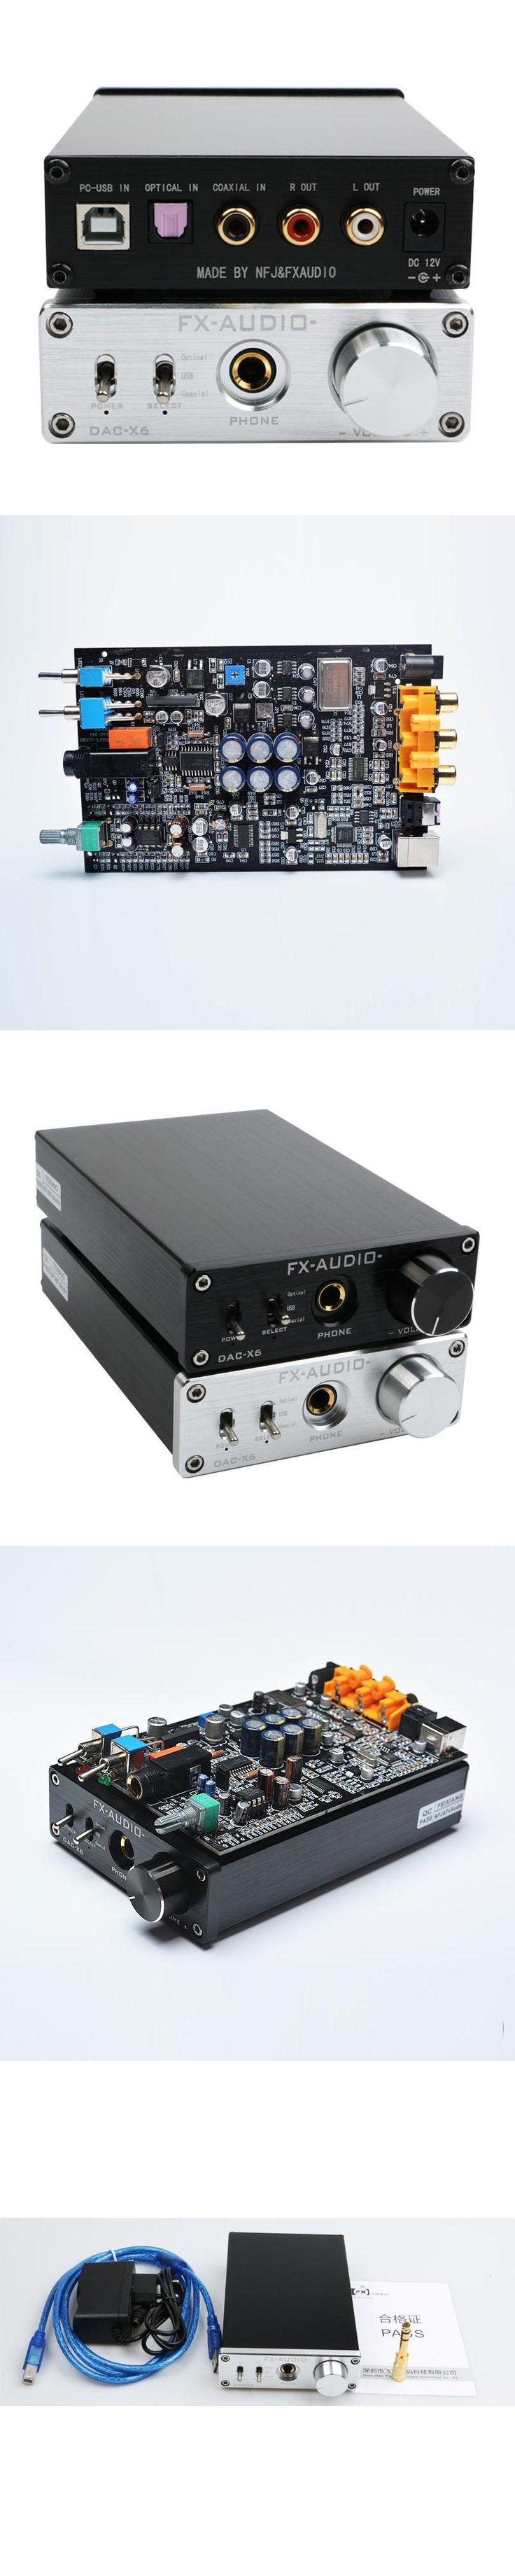 fx-audio feixiang DAC-X6 fever MINI HiFi USB DAC Fiber Coaxial Digital Audio Decoder 16BIT / 192 headphone amplifier amp TPA6120